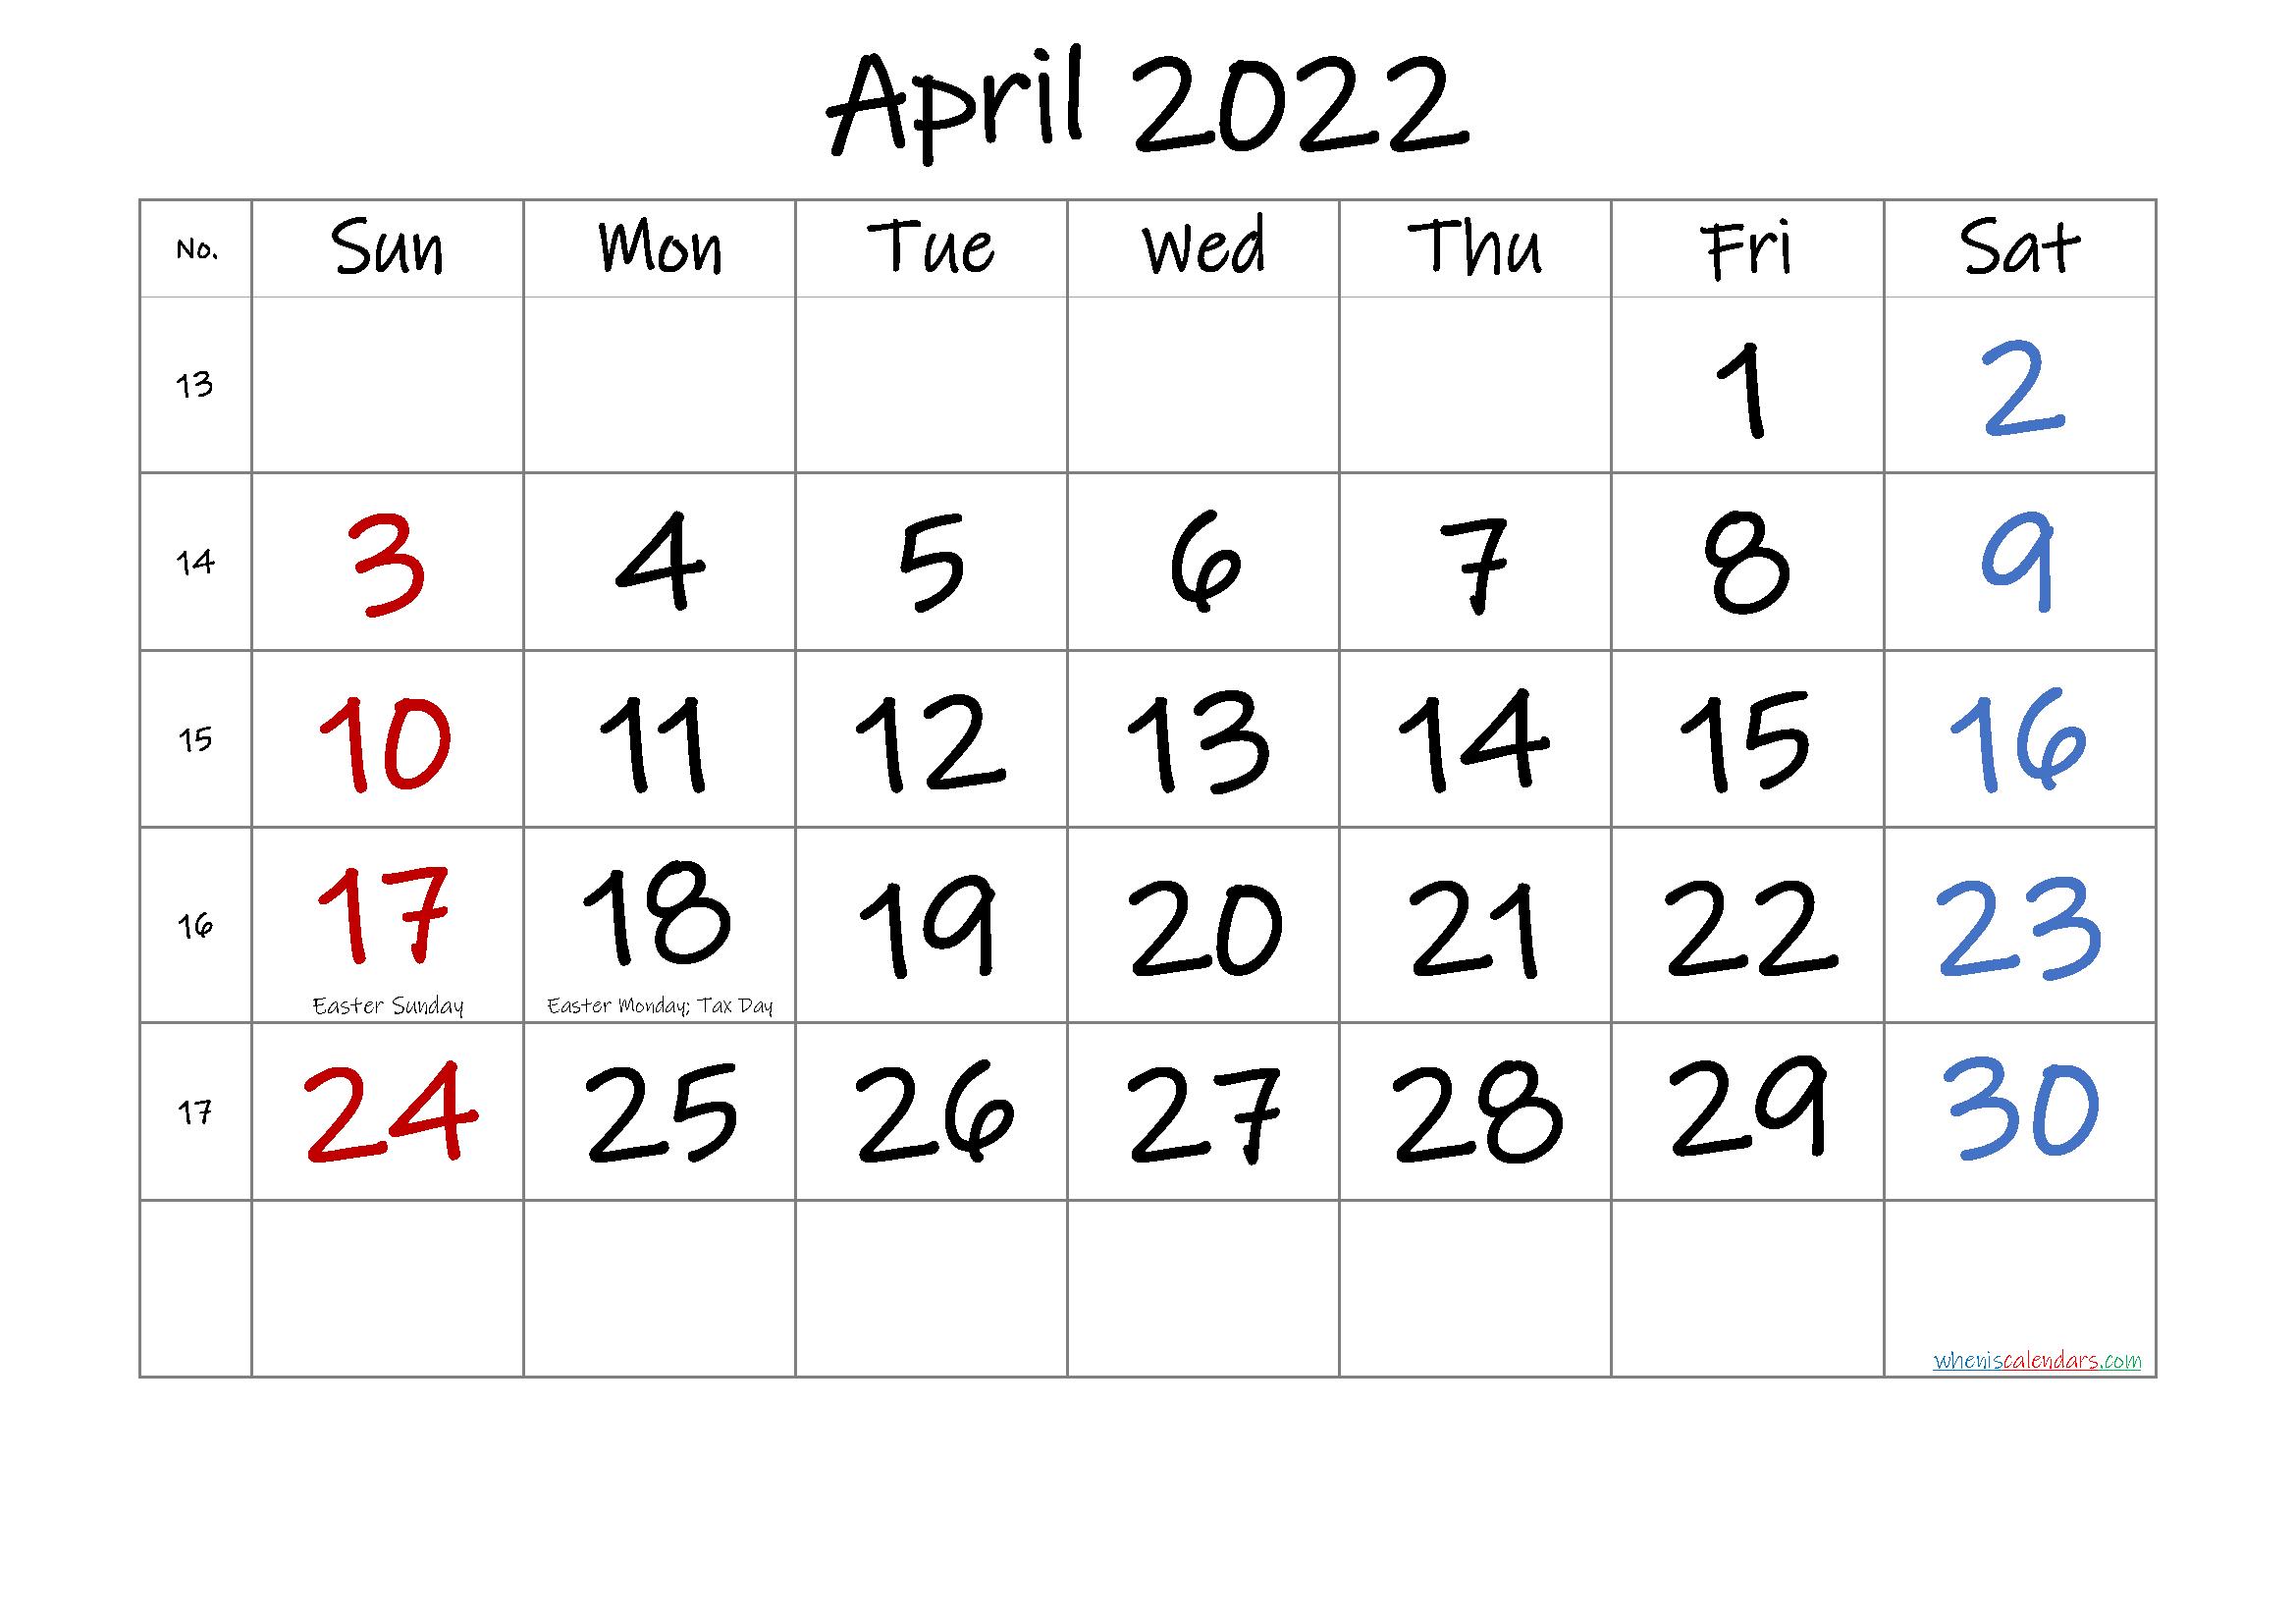 APRIL 2022 Printable Calendar with Holidays